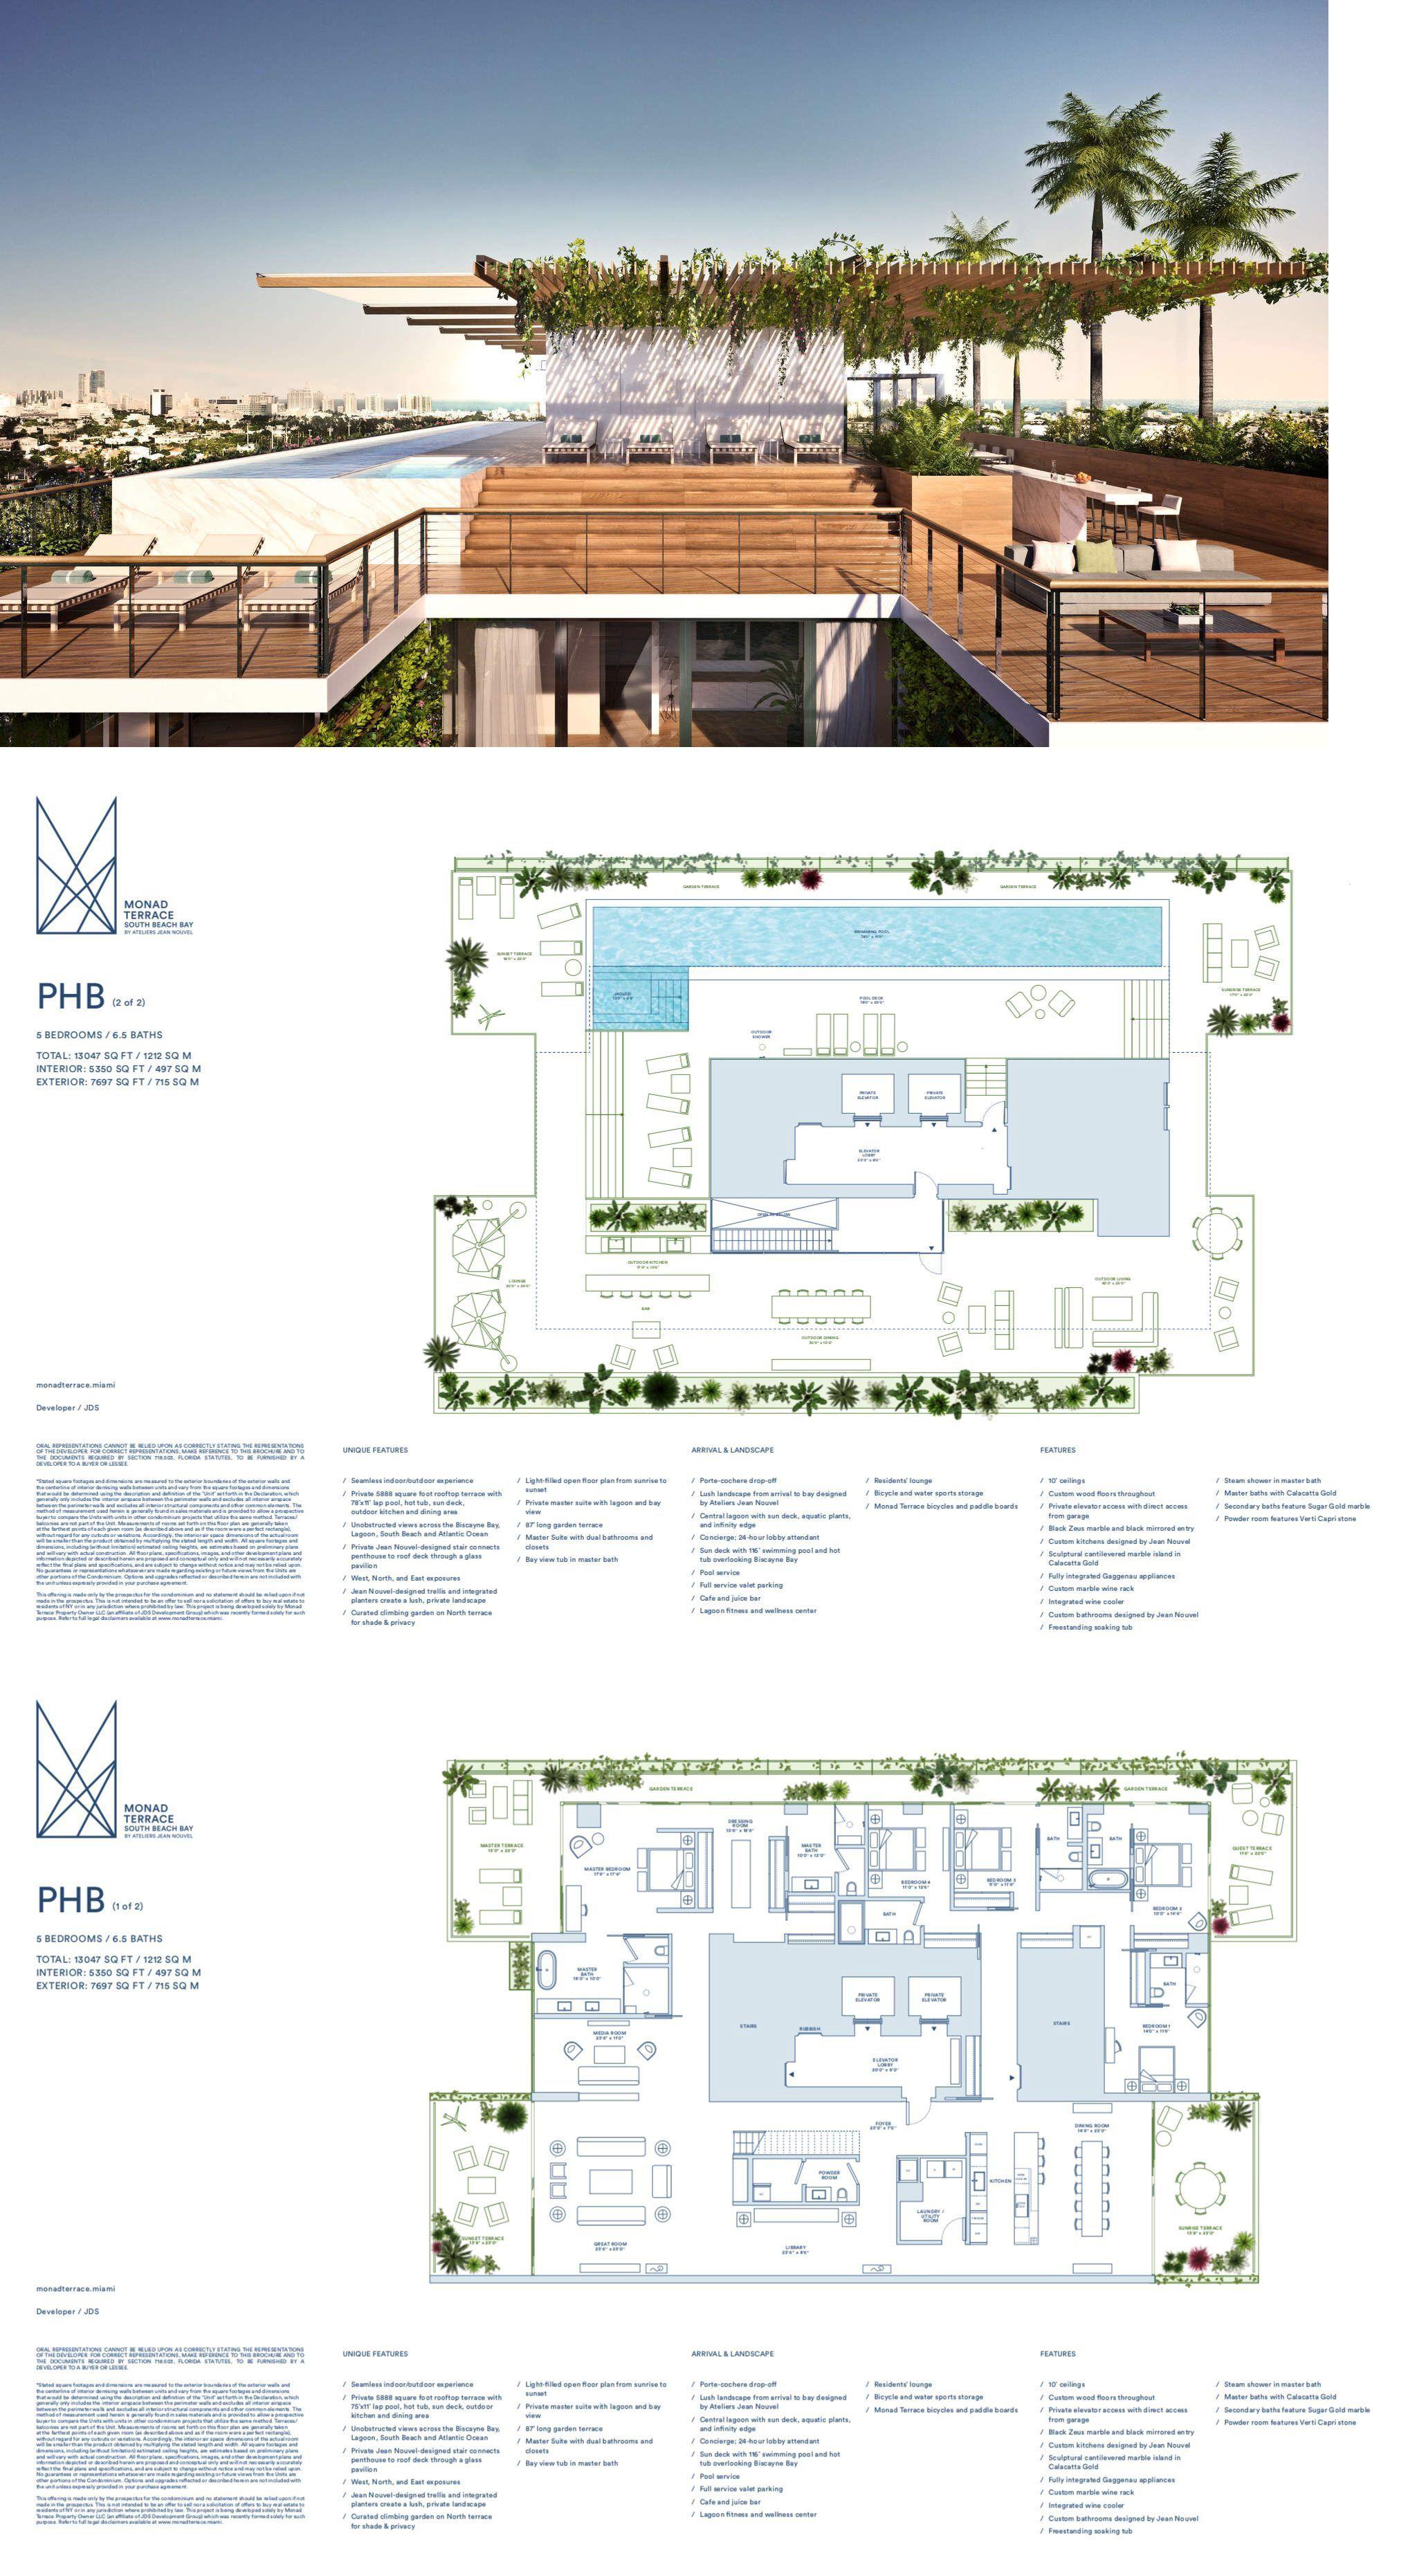 Monad Terrace Luxury Condos For Sale In Miami South Beach Beach House Floor Plans Mansion Floor Plan Architectural Floor Plans